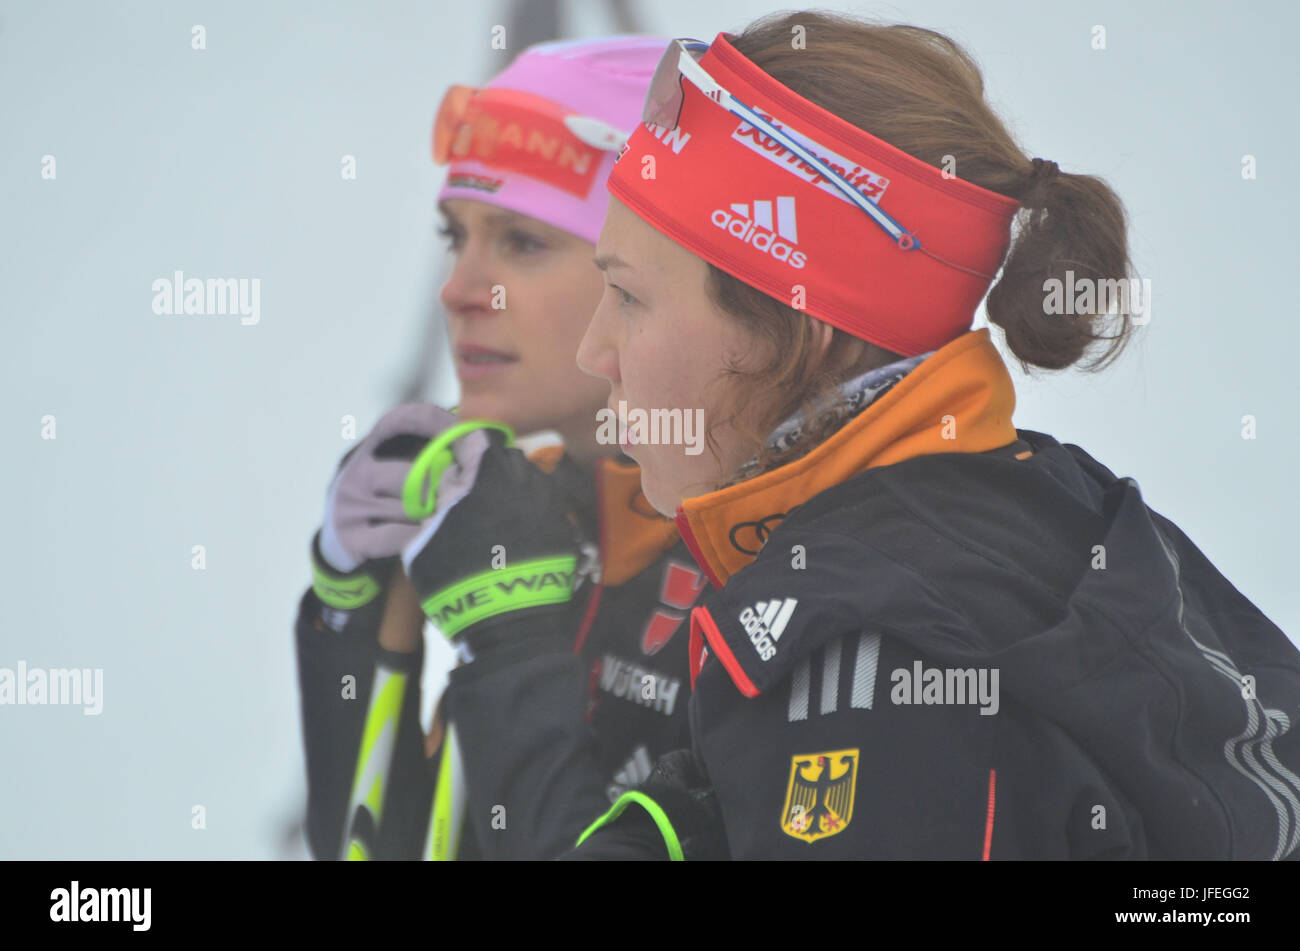 Wintersport, Biathlon, Weltmeisterschaft, Antholz, Biathleten, GER Stockbild